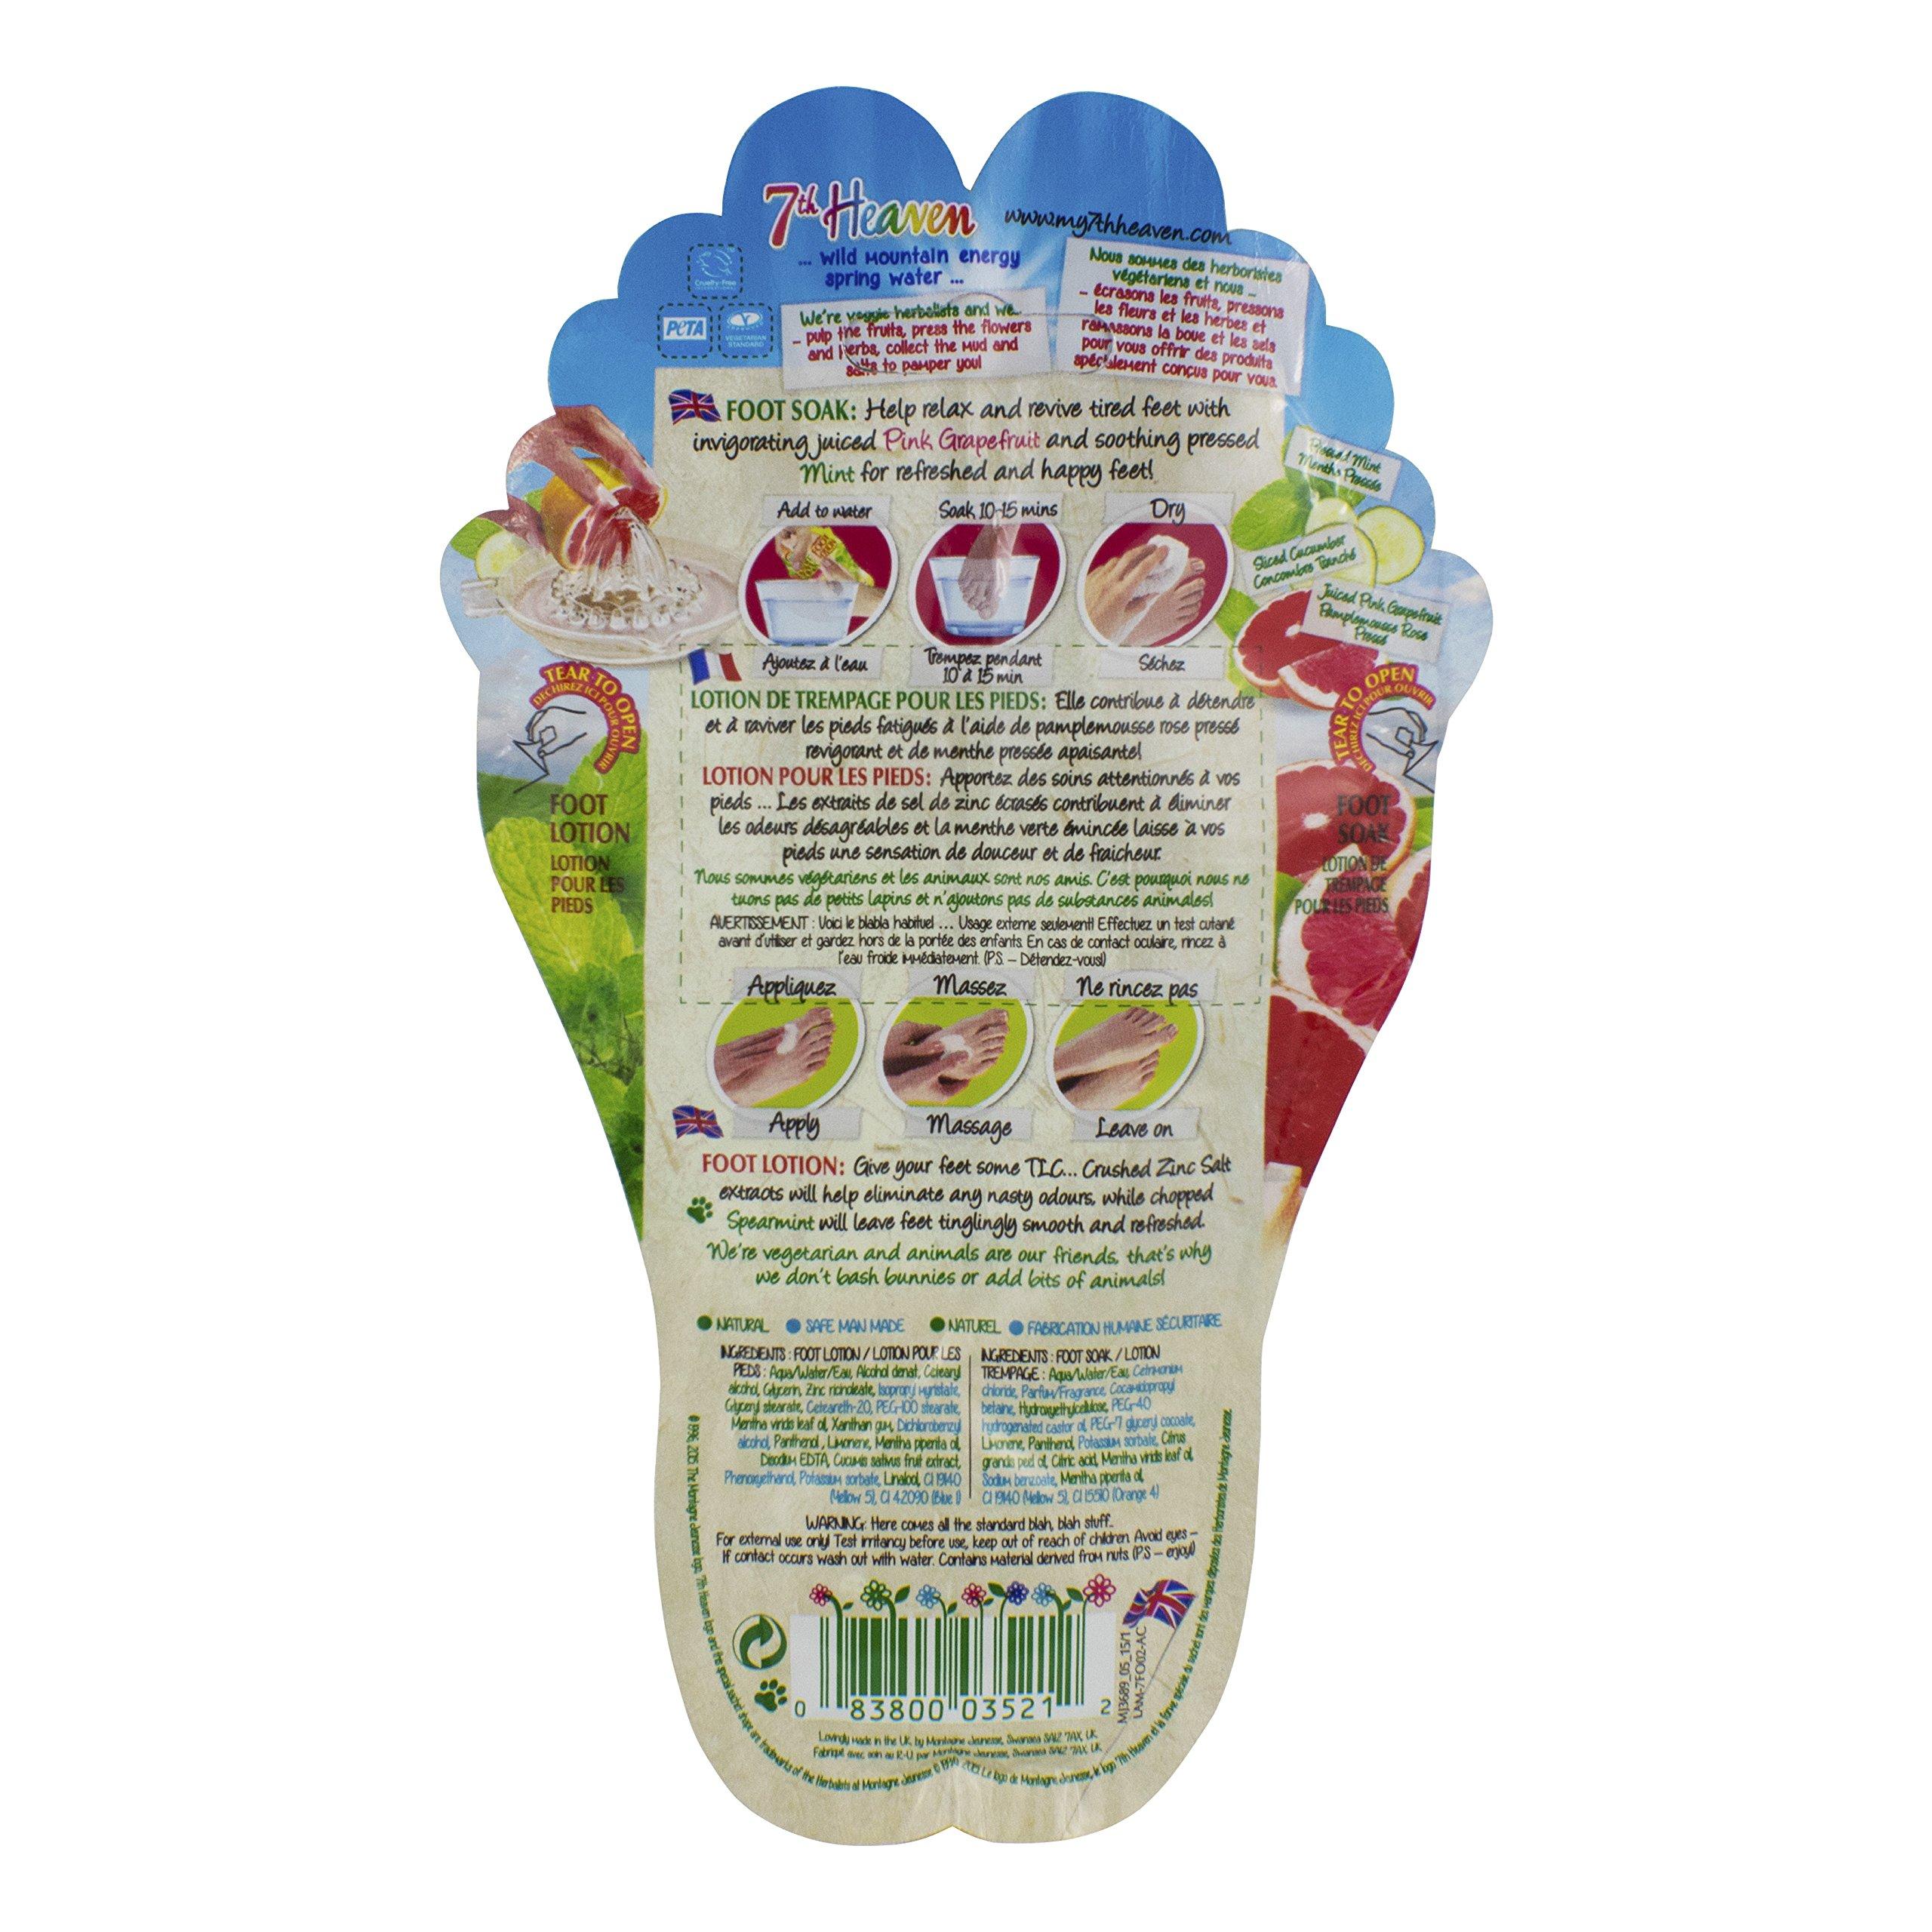 7th Heaven Foot Soak & Foot Lotion Packet, Grapefruit & Mint (Pack of 6)